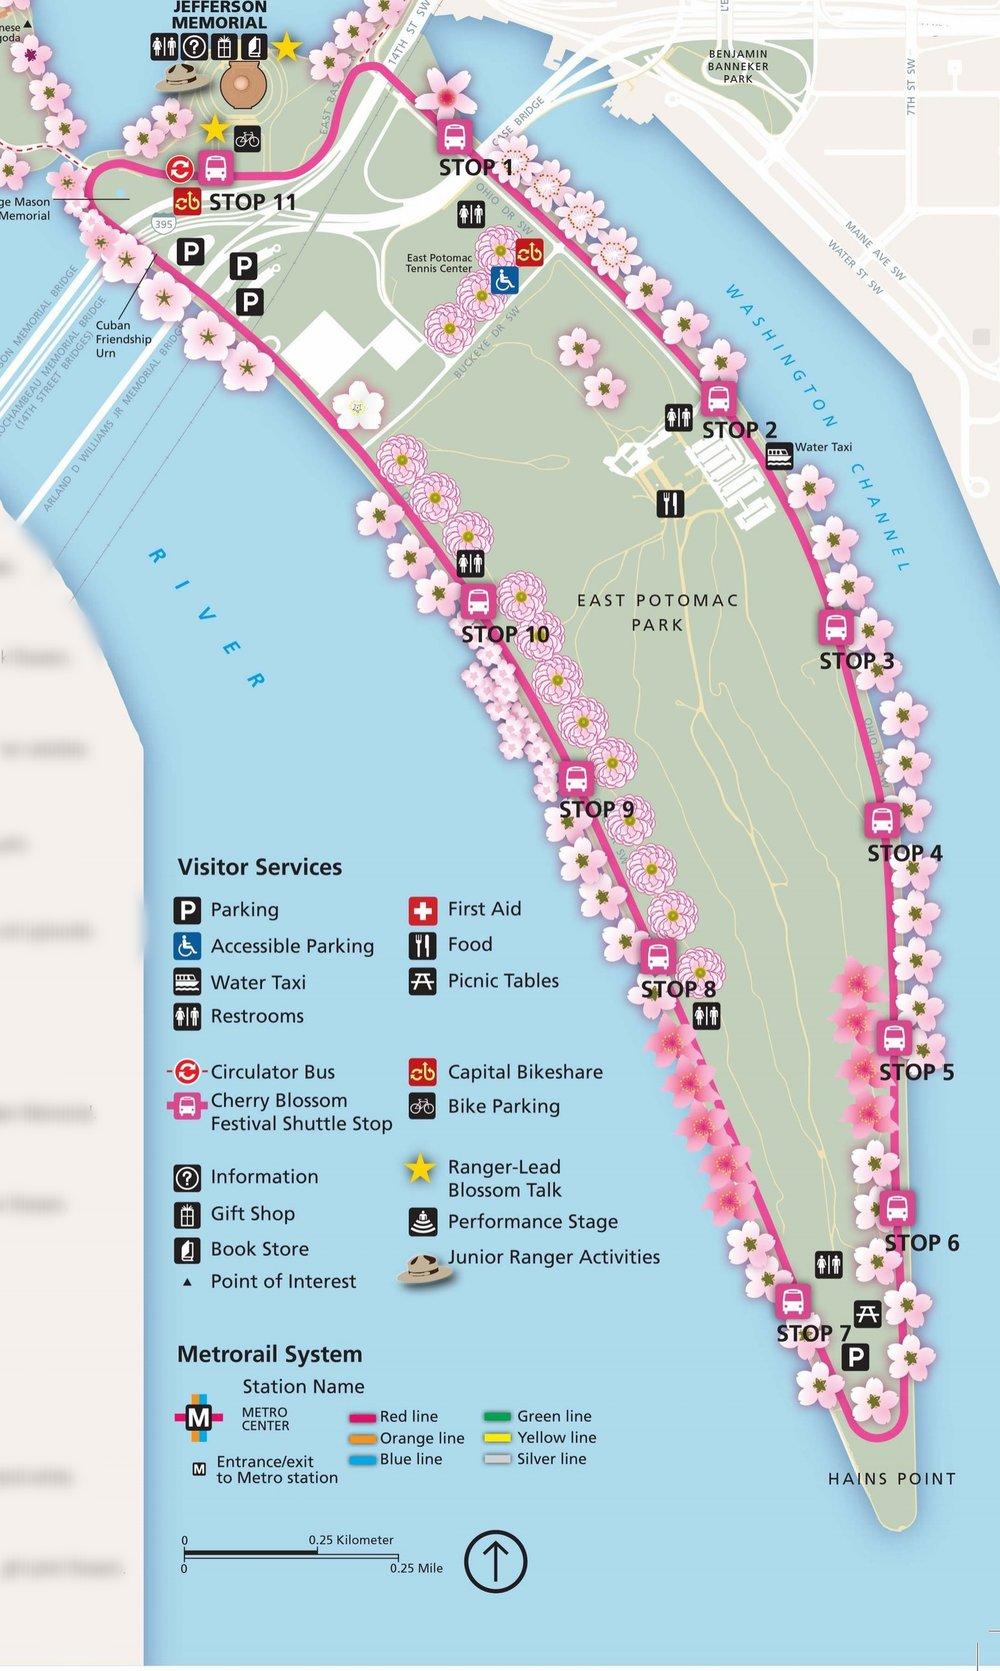 National Cherry Blossom Festival Tips and Tricks Urban Atlas